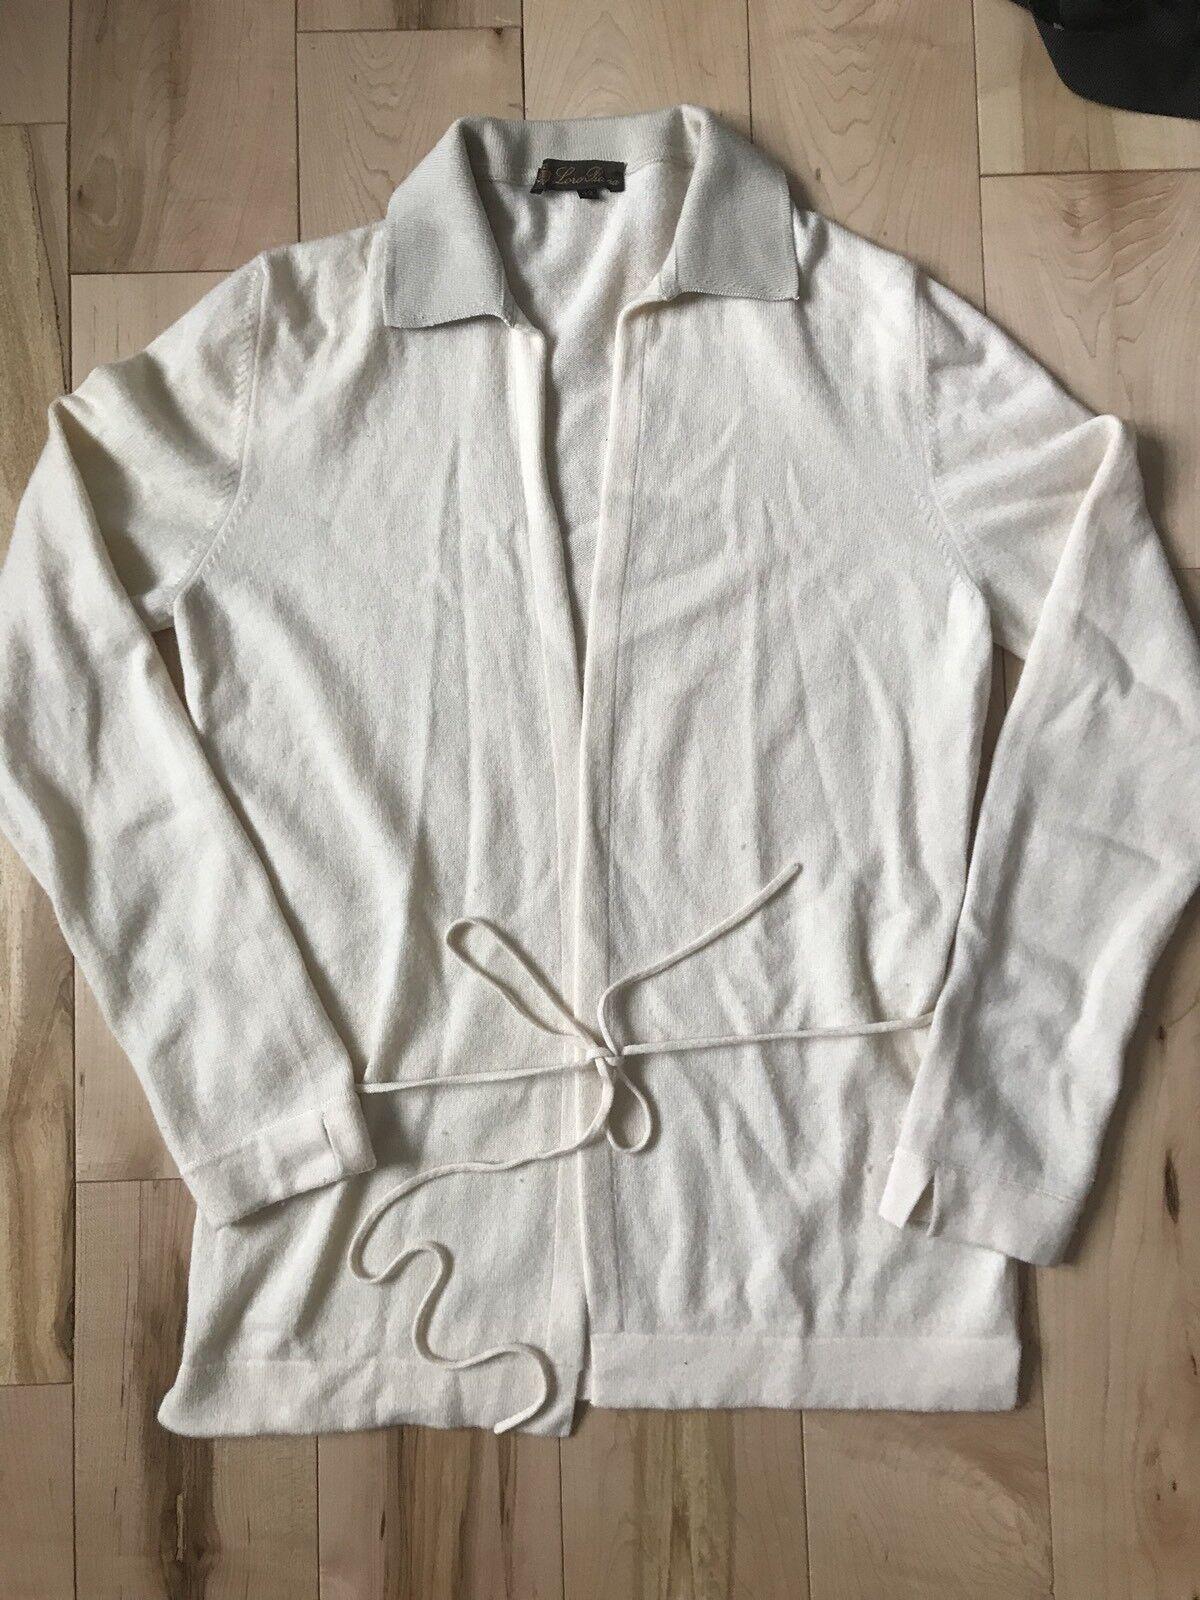 Lgold Piana Cream Ivory Cashmere & Cotton Cardigan Sweater Top SZ 42